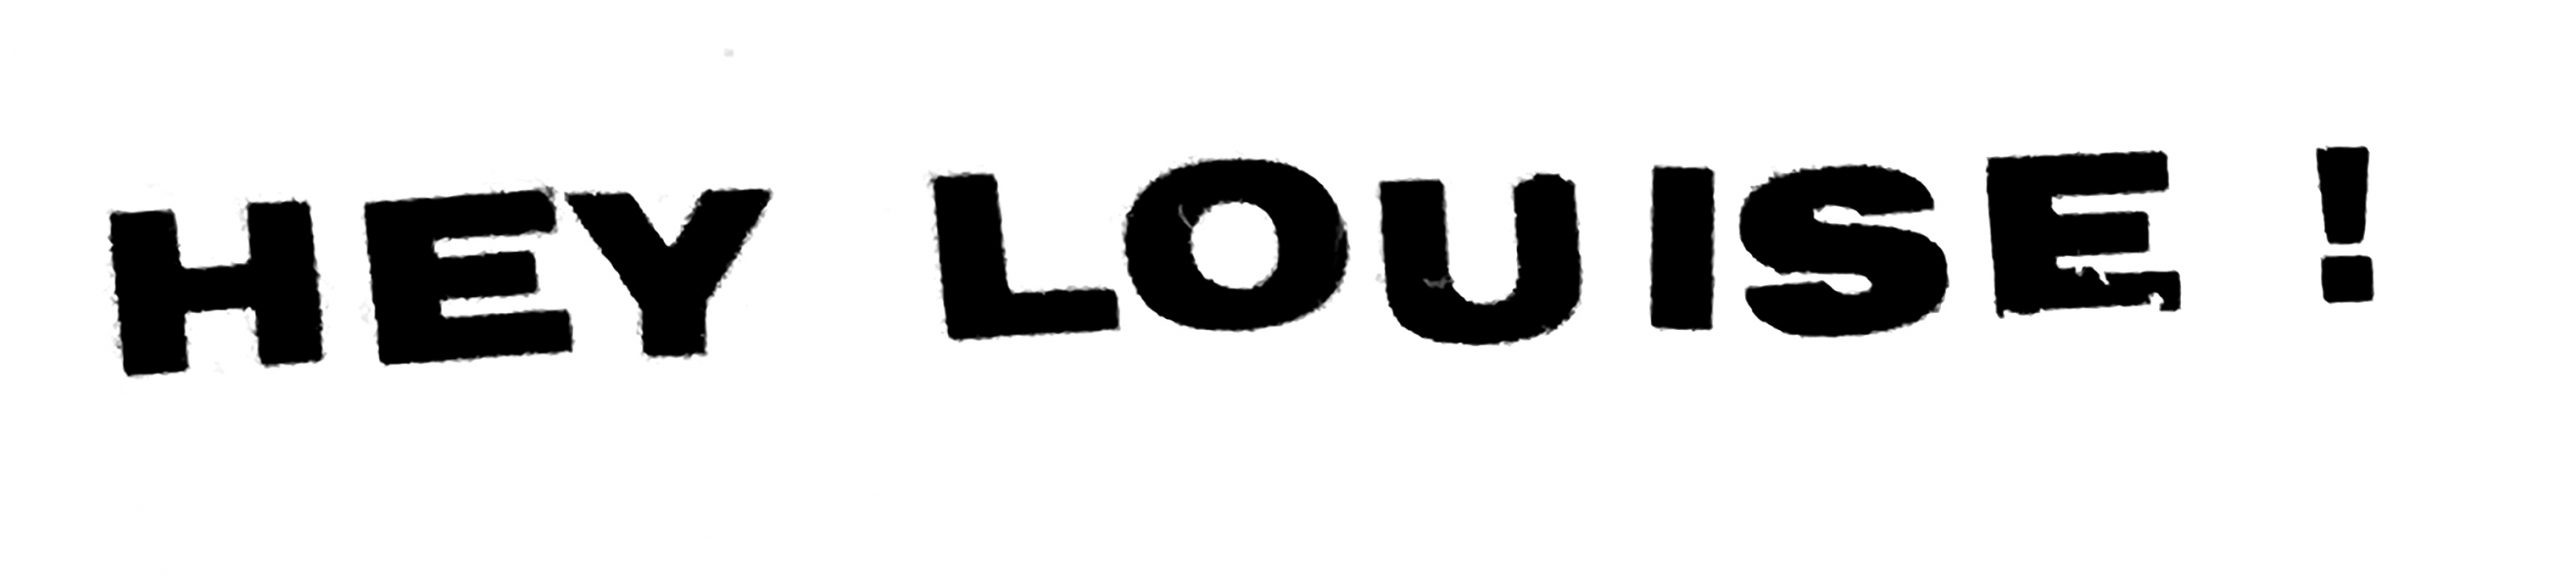 Hey Louise !